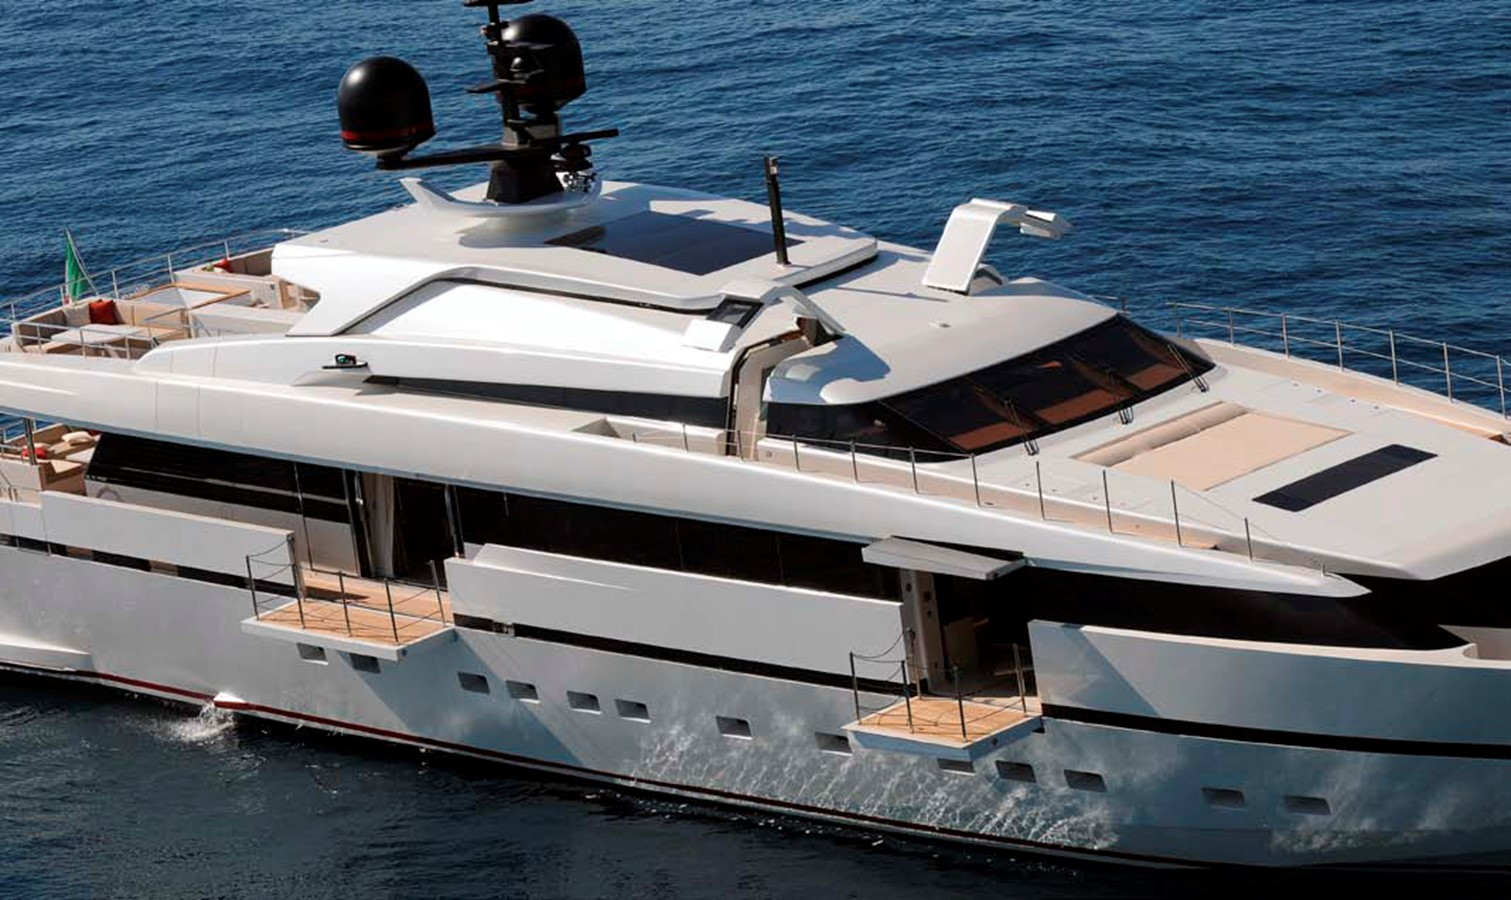 2013 SANLORENZO 40ALLOY Motor Yacht 1356921